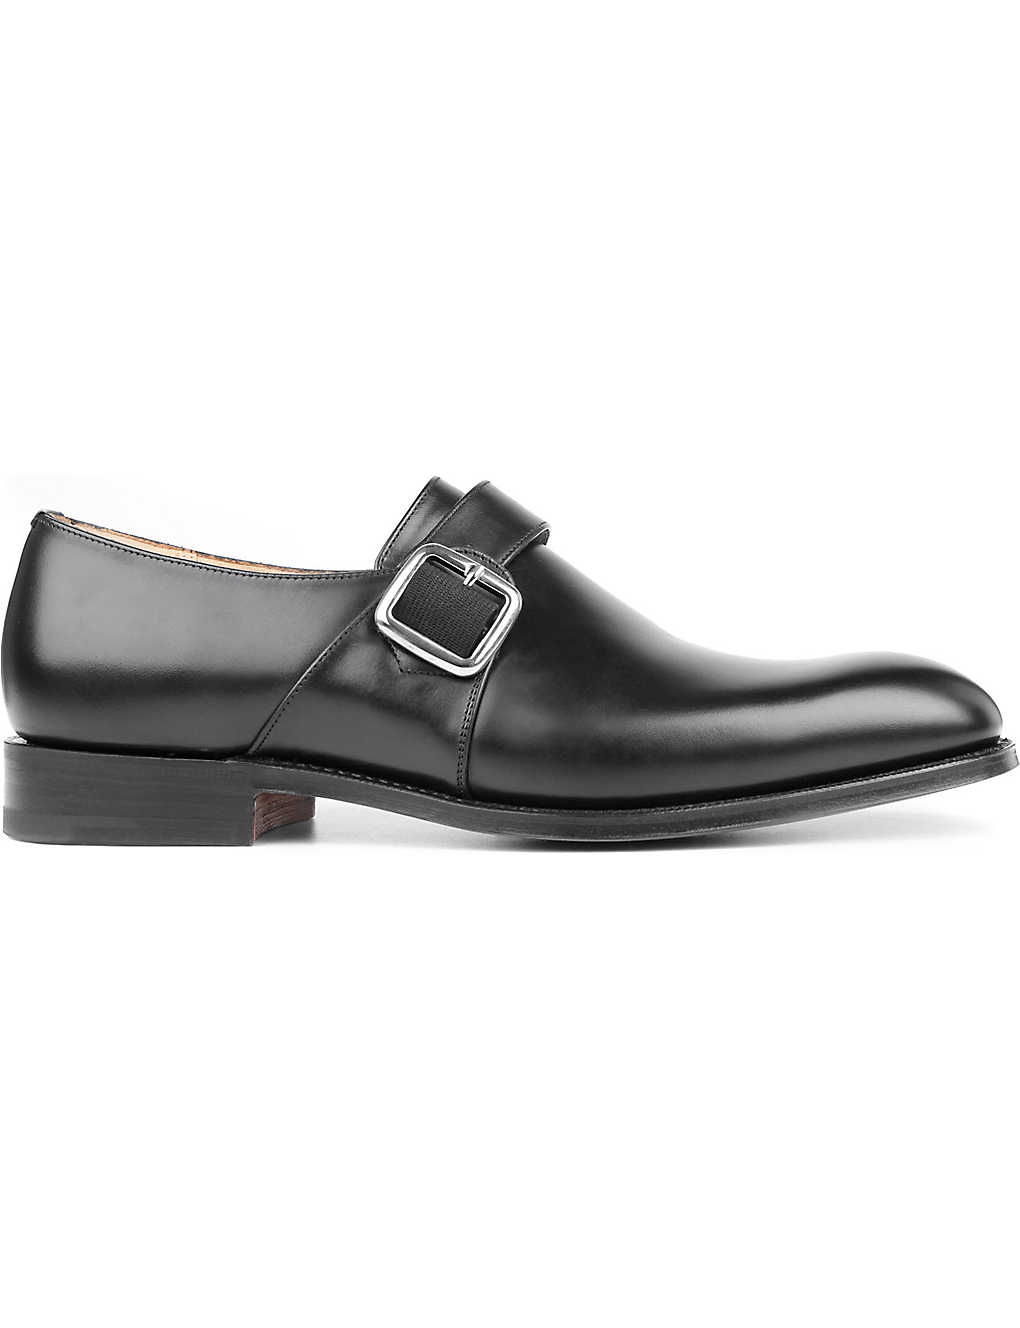 1f2c3dfcfb653 CHURCH - Westbury G monk shoes | Selfridges.com